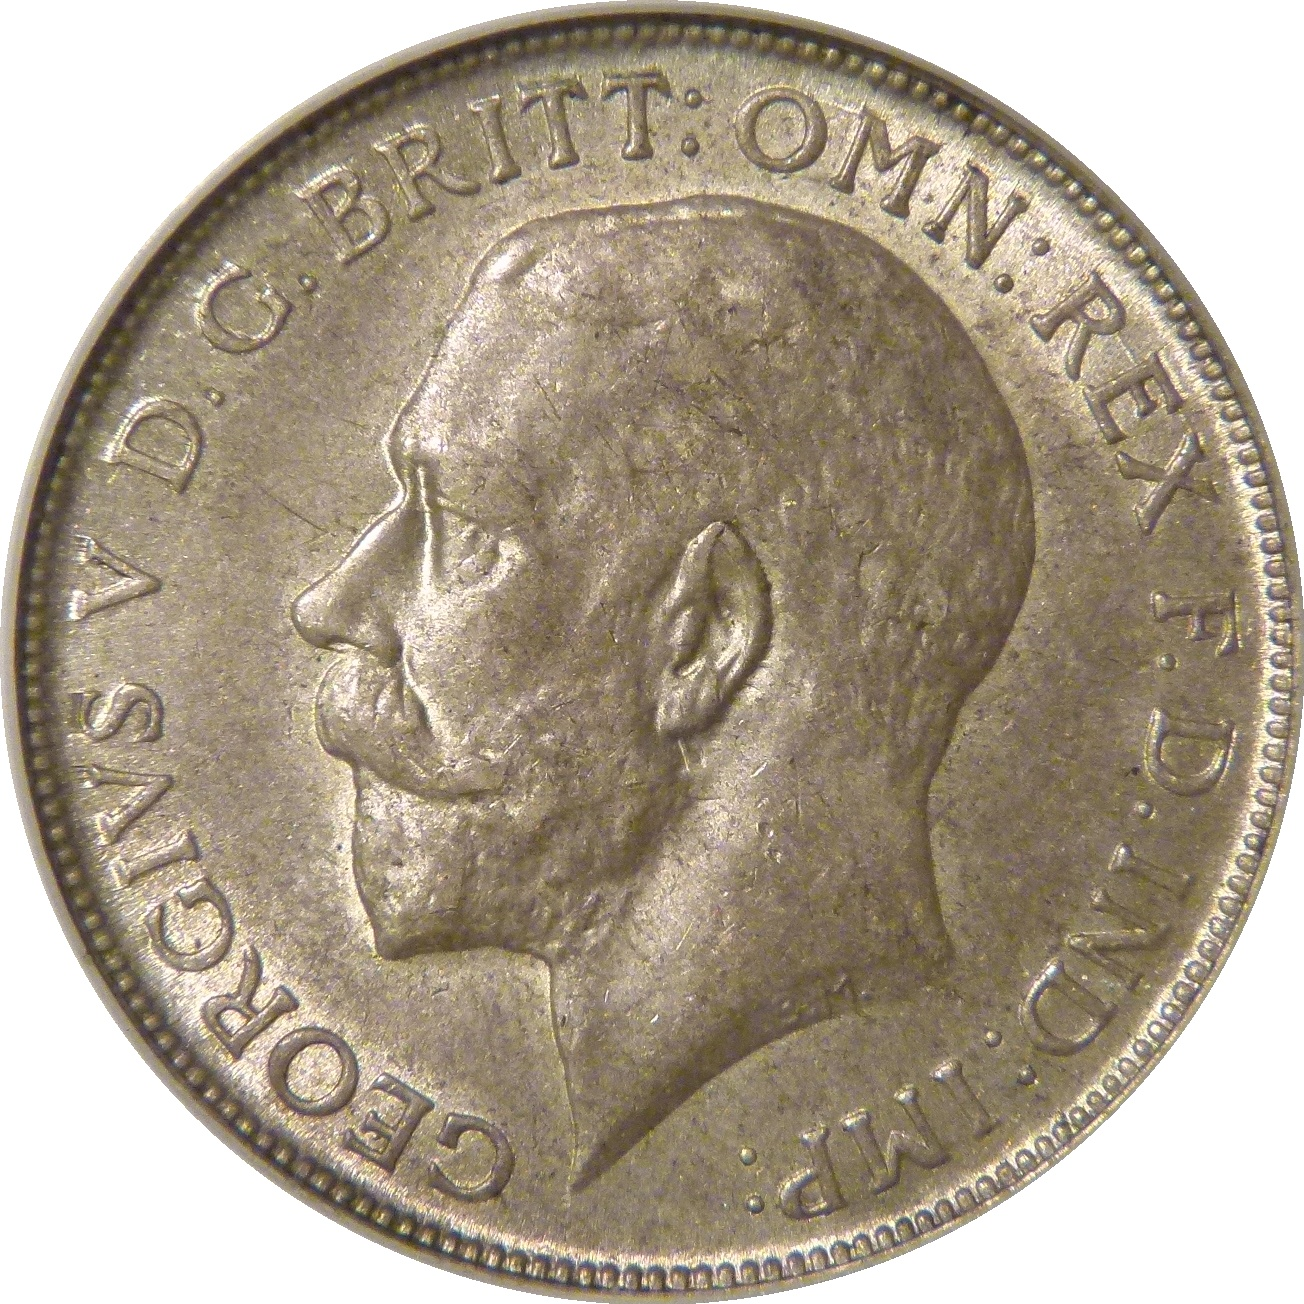 1919 Florin, CGS 70(MS 60-61), aUNC, George V, ESC 938, UIN 13796